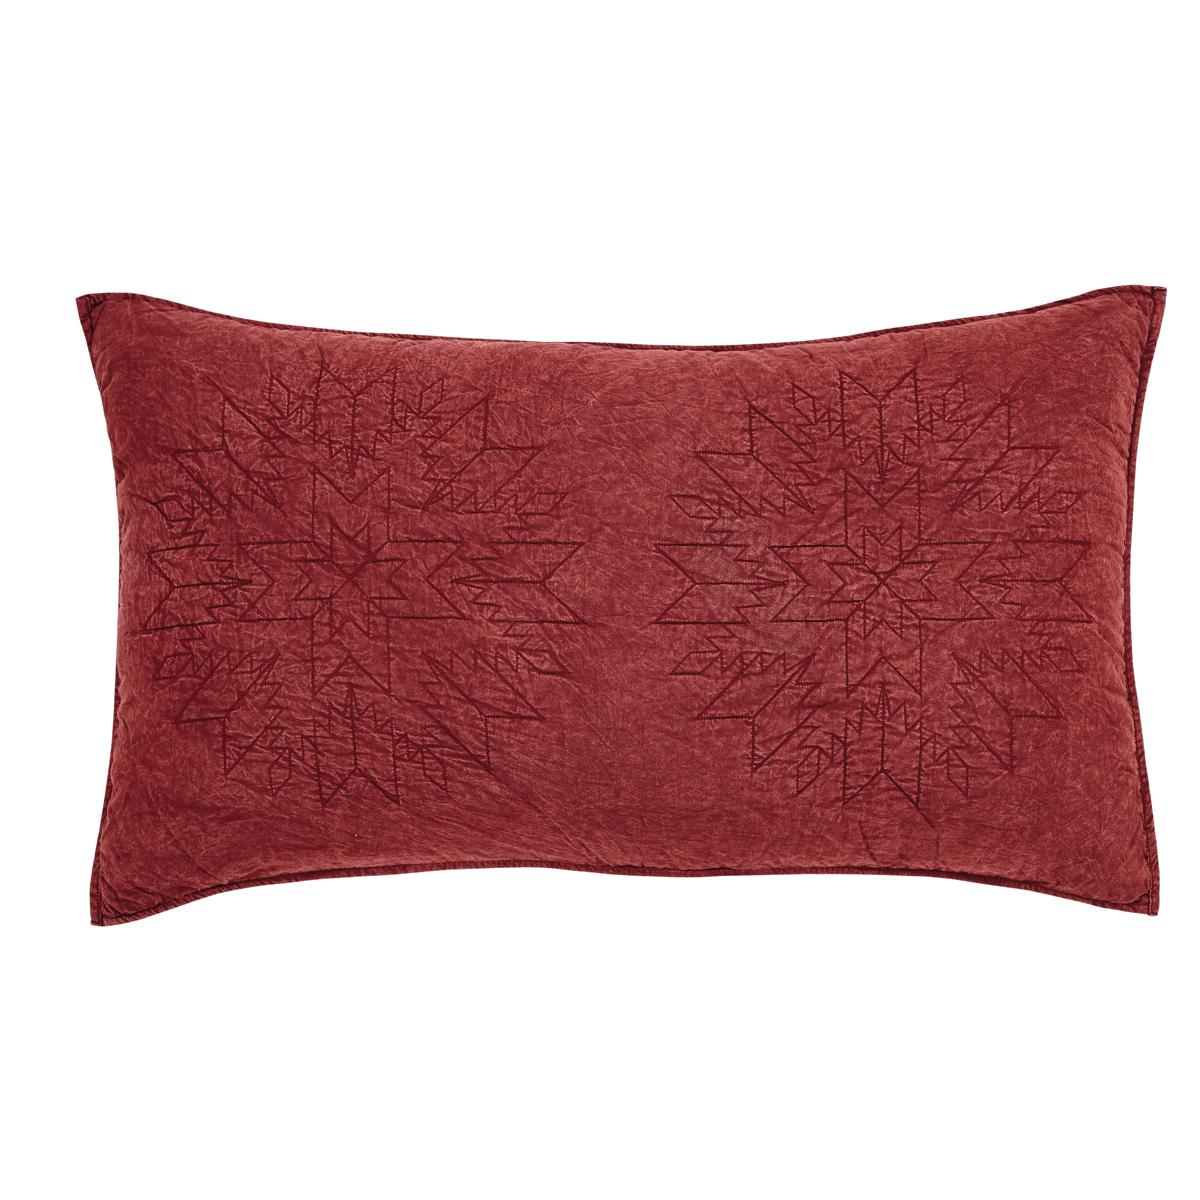 Western Star Home Decor Cheyenne American Red Luxury Pillow Sham Teton